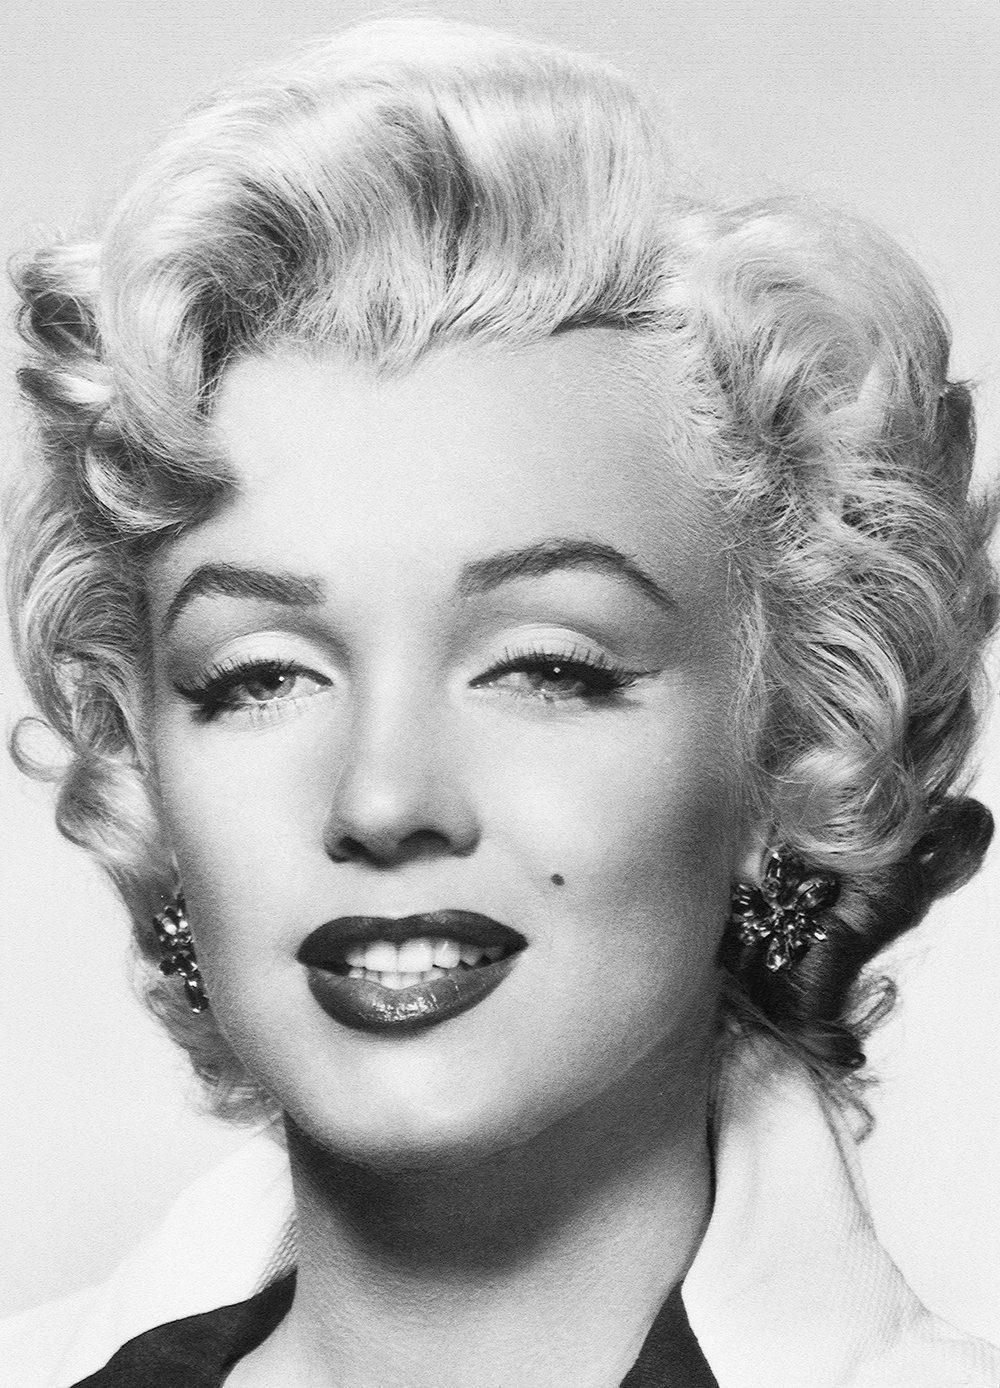 Fototapete »Marilyn Monroe«, 4-teilig, 183x254 cm